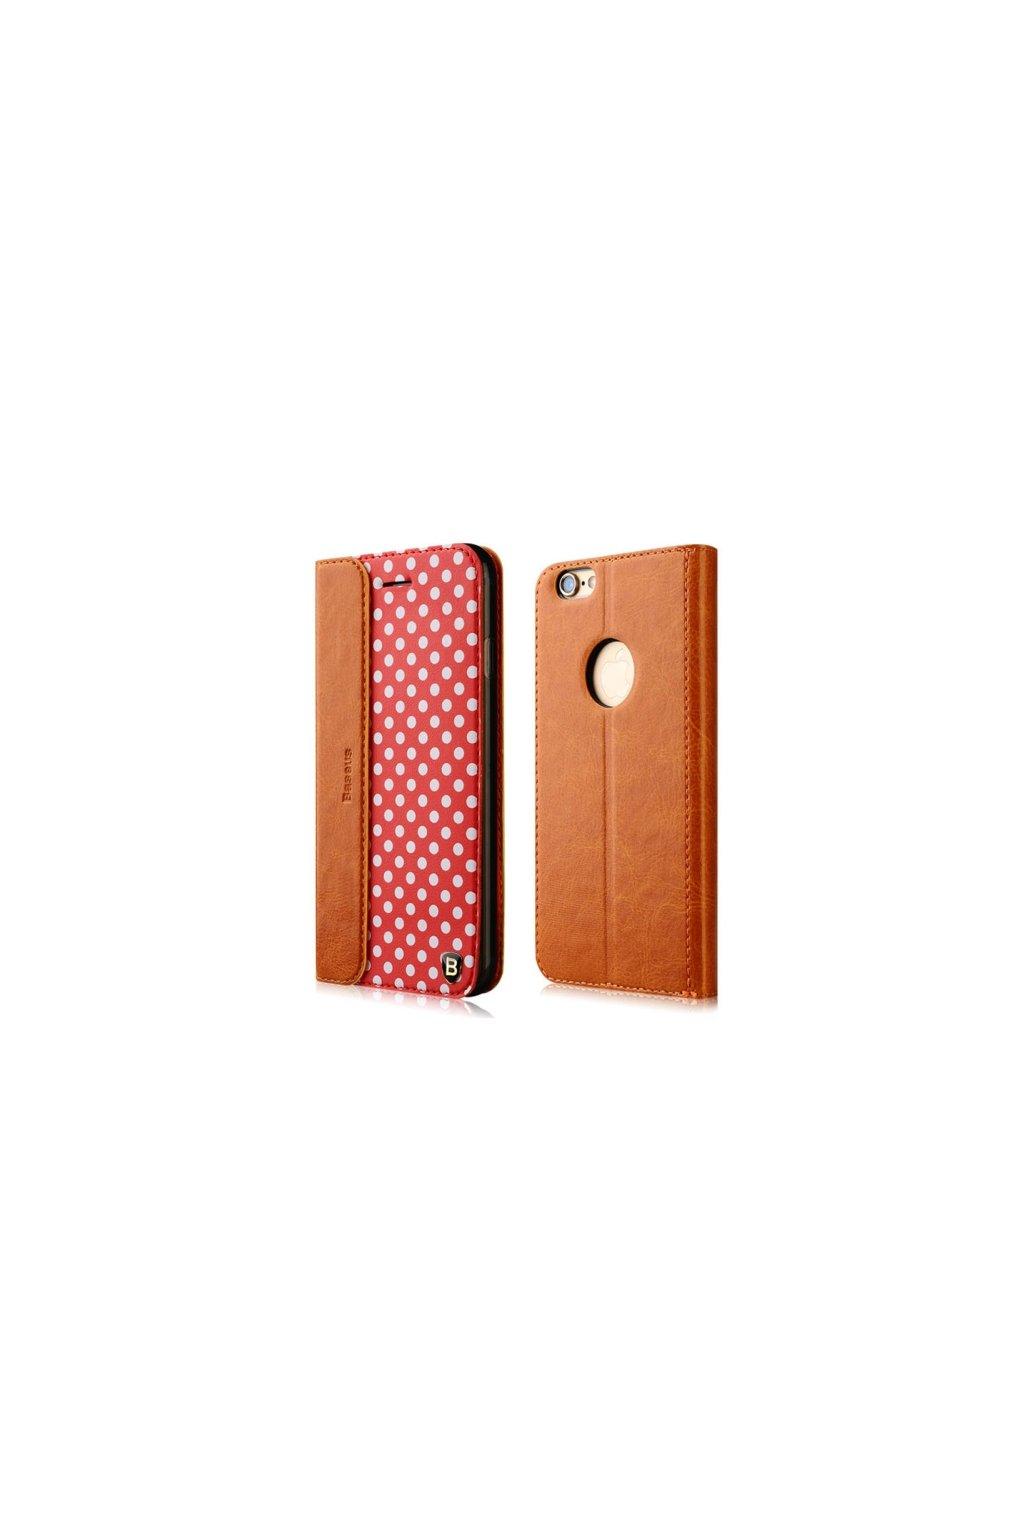 Apple iPhone 6 pouzdro Baseus Collocation flip, red/červená